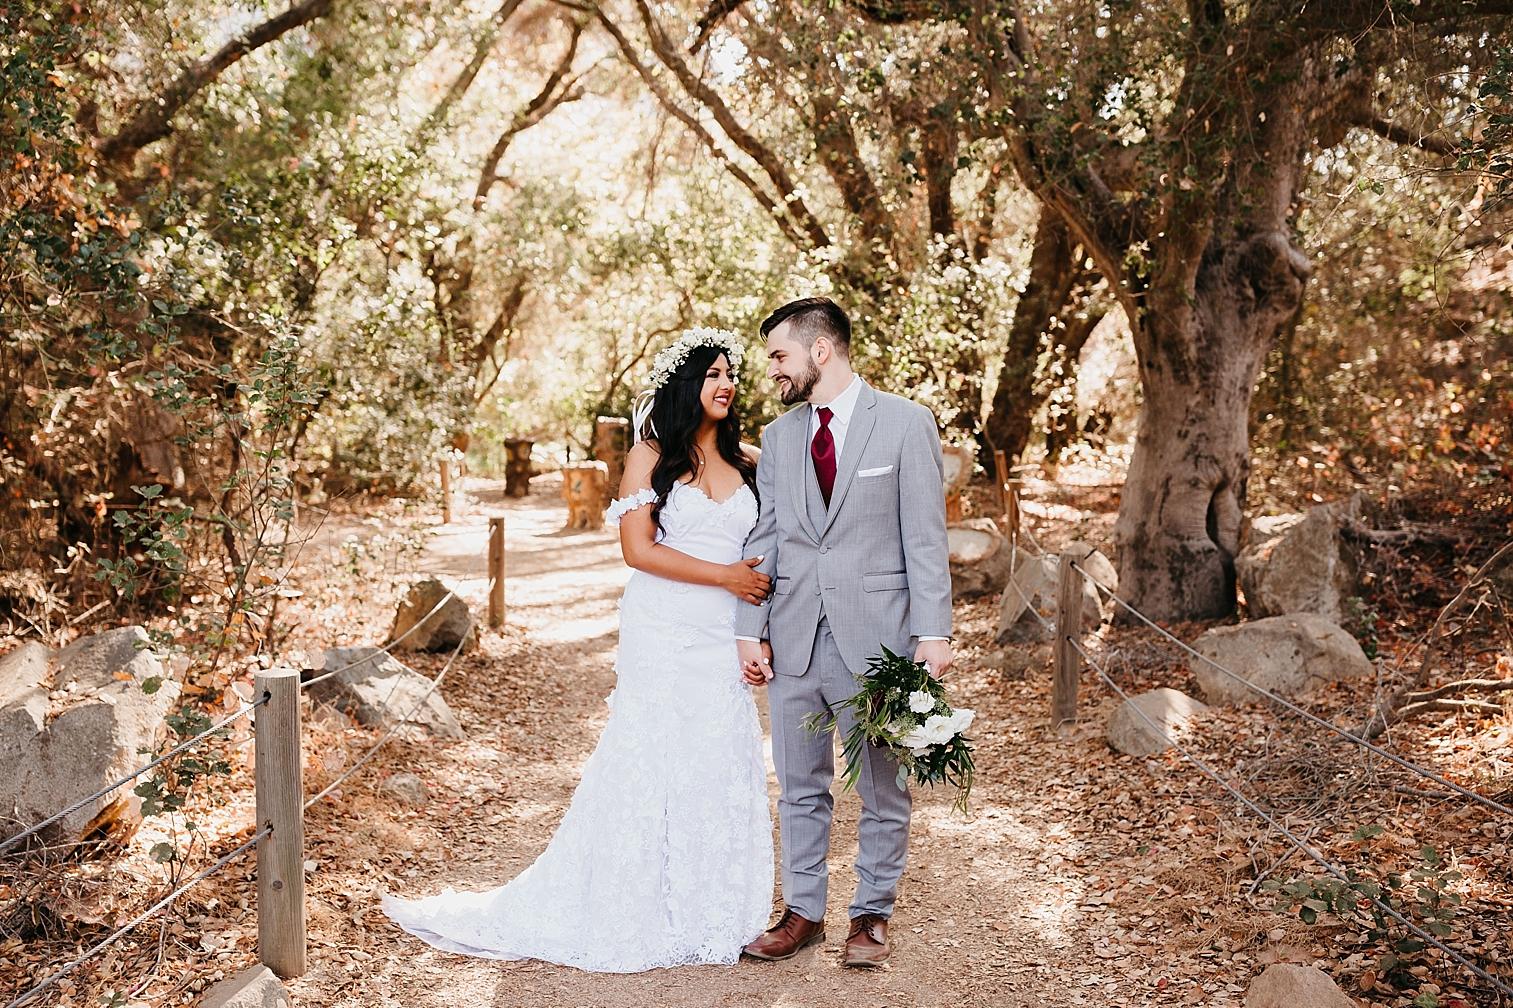 Bride and groom portrait at a backyard wedding